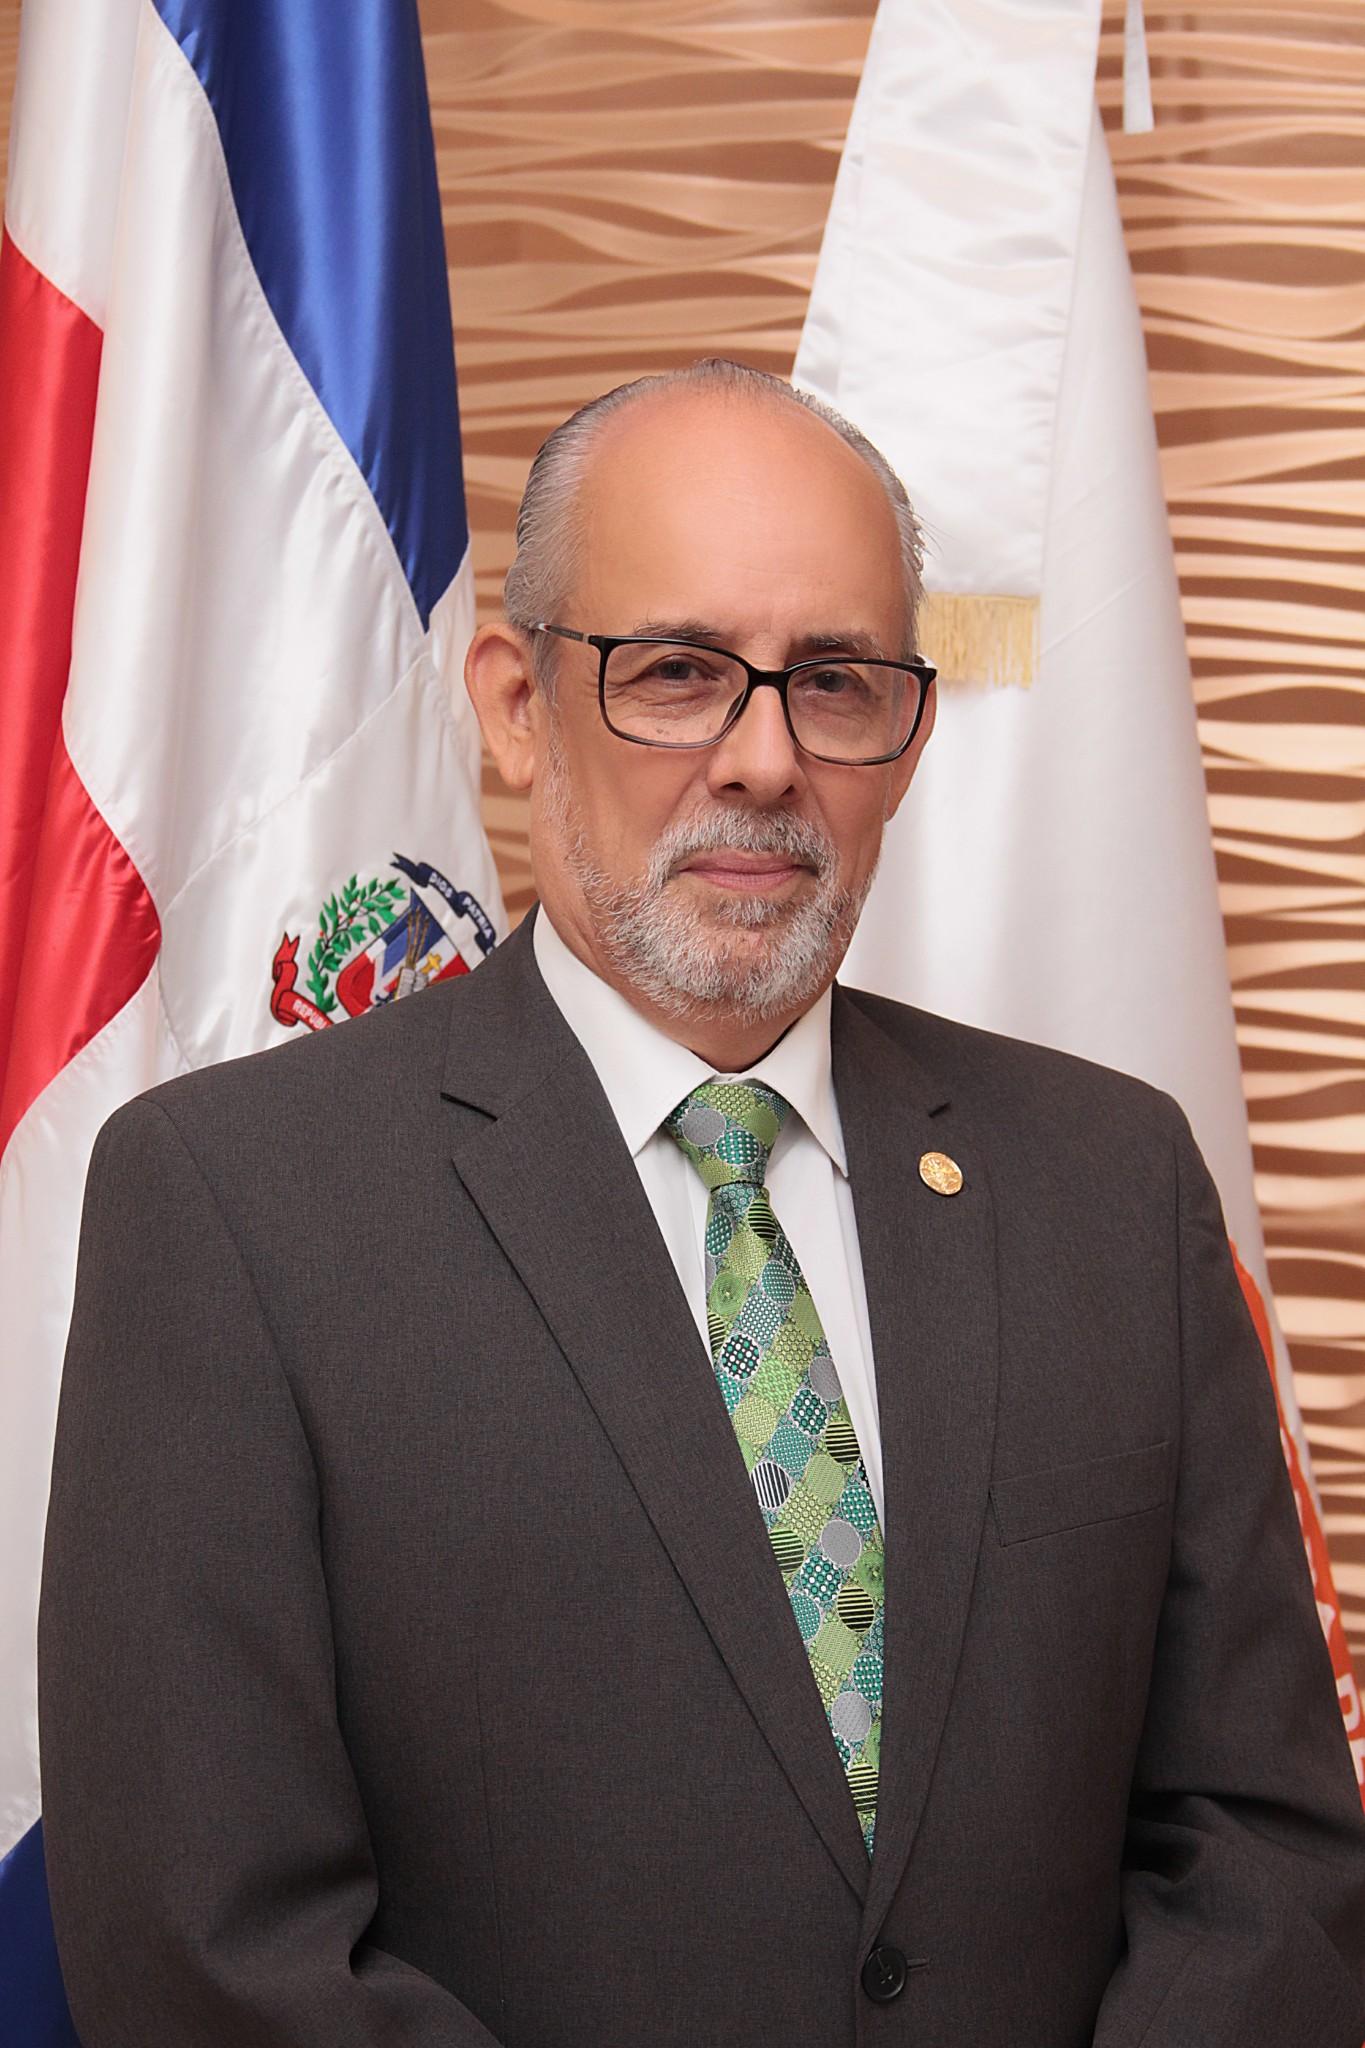 Doctor Edgar Allan Vargas